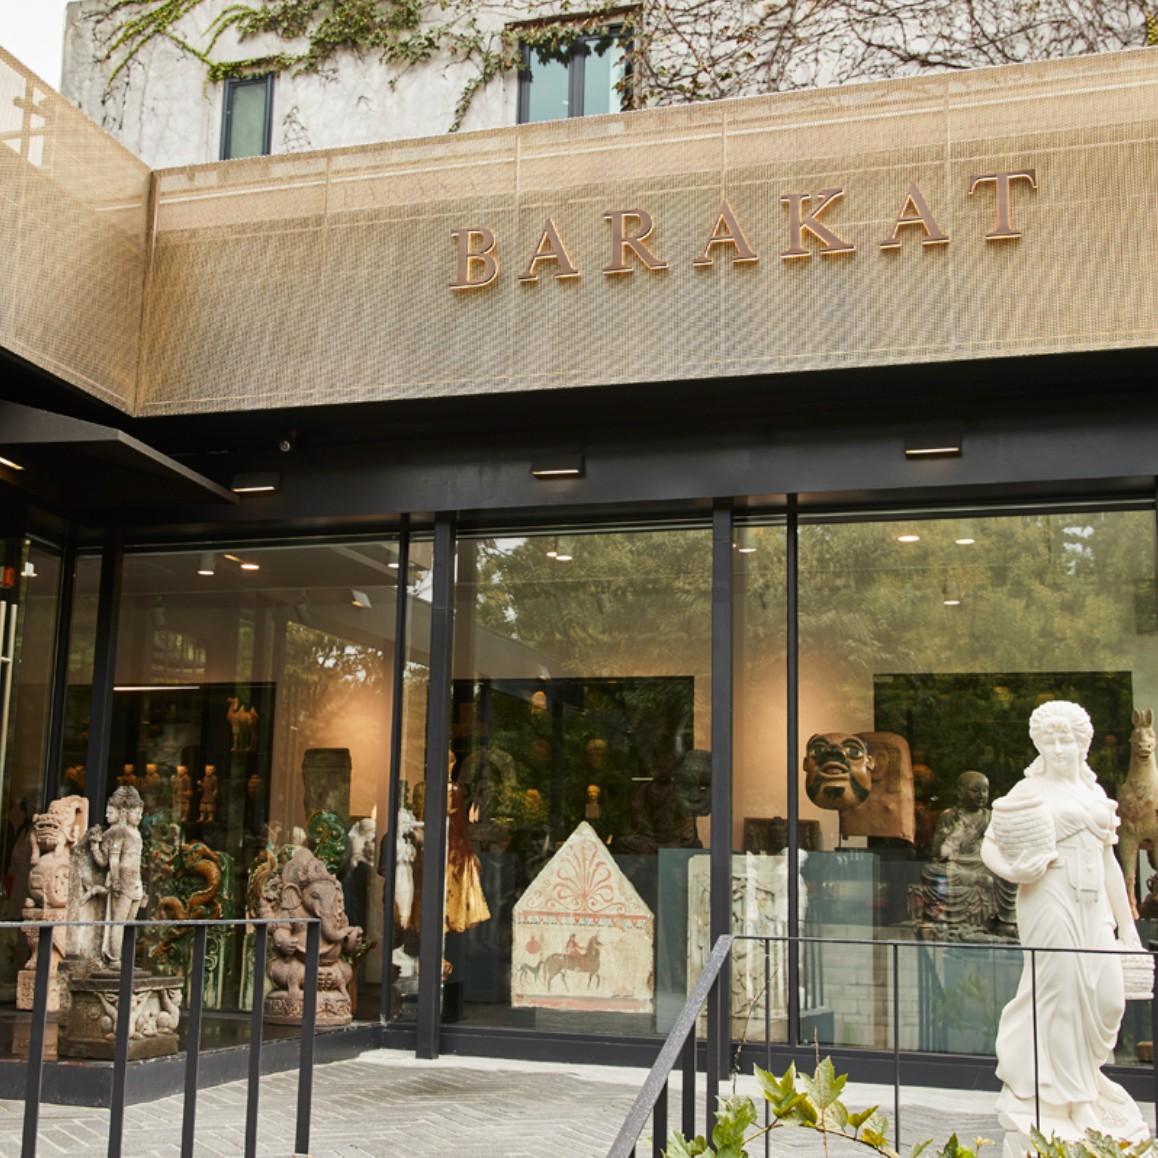 Barakat Gallery, Seoul  - GalleriesNow.net